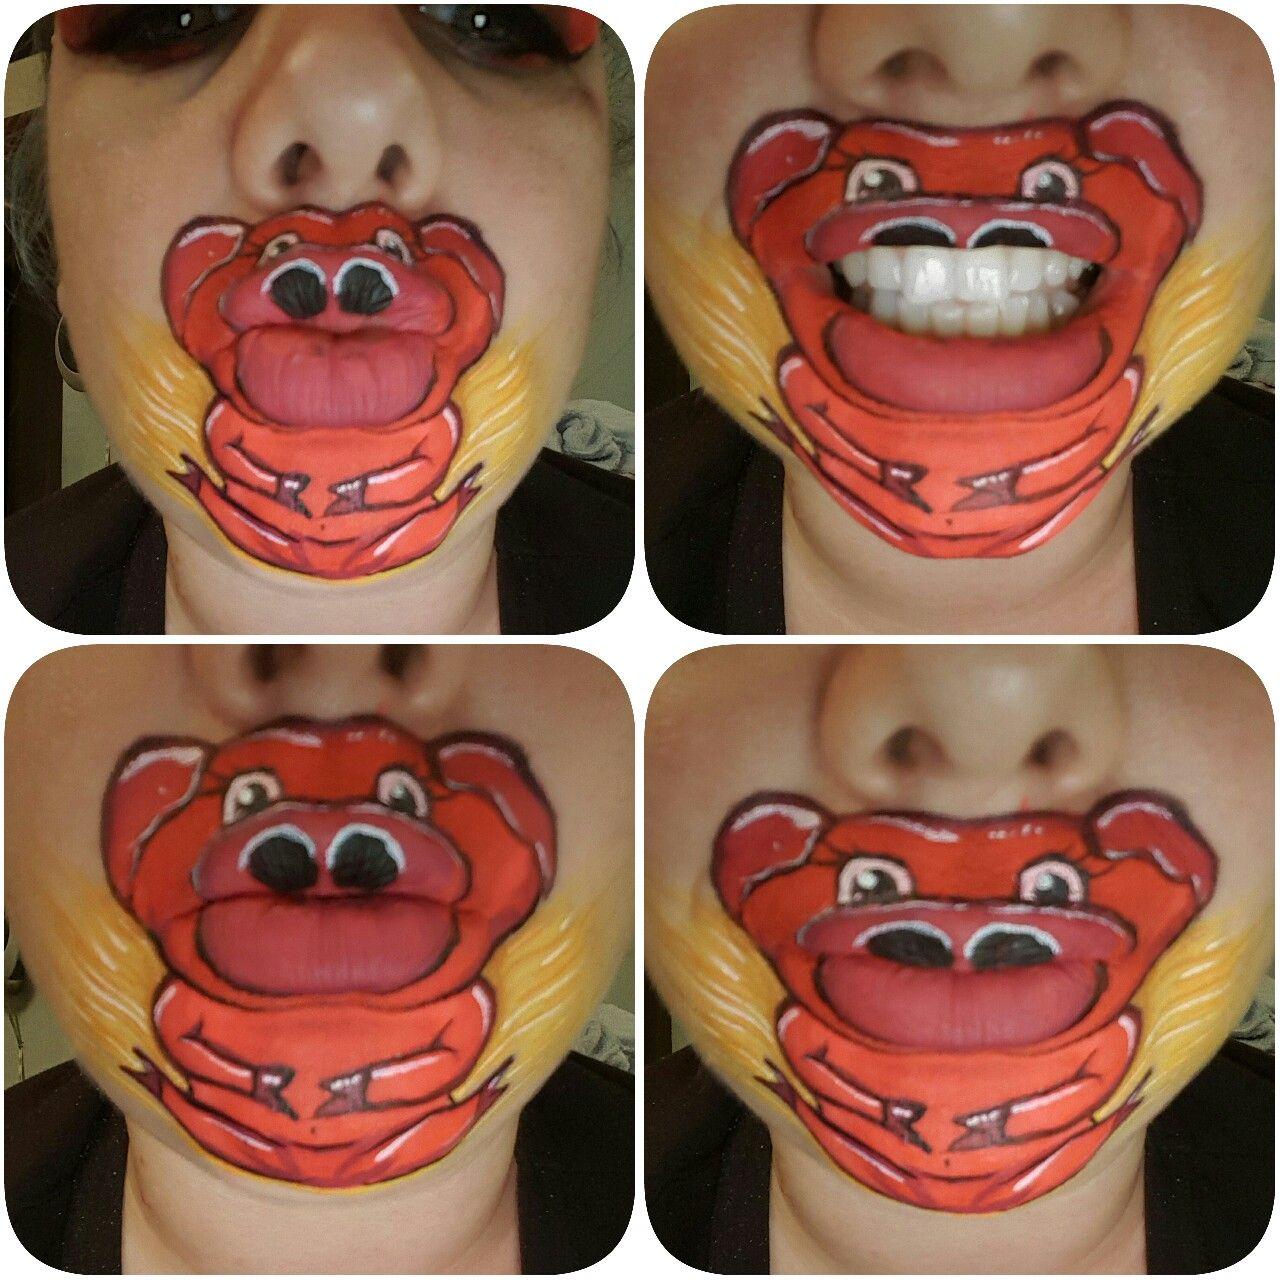 Fun on the farm #enchantedbrush #facepaint #facepainting #facepainter #facepaintart #glasgowfacepainter #mouthpainting #mouthart #pigfacepaint #pigfacepainting #oink #pig #pigs #onthefarm #lipart #lippaint